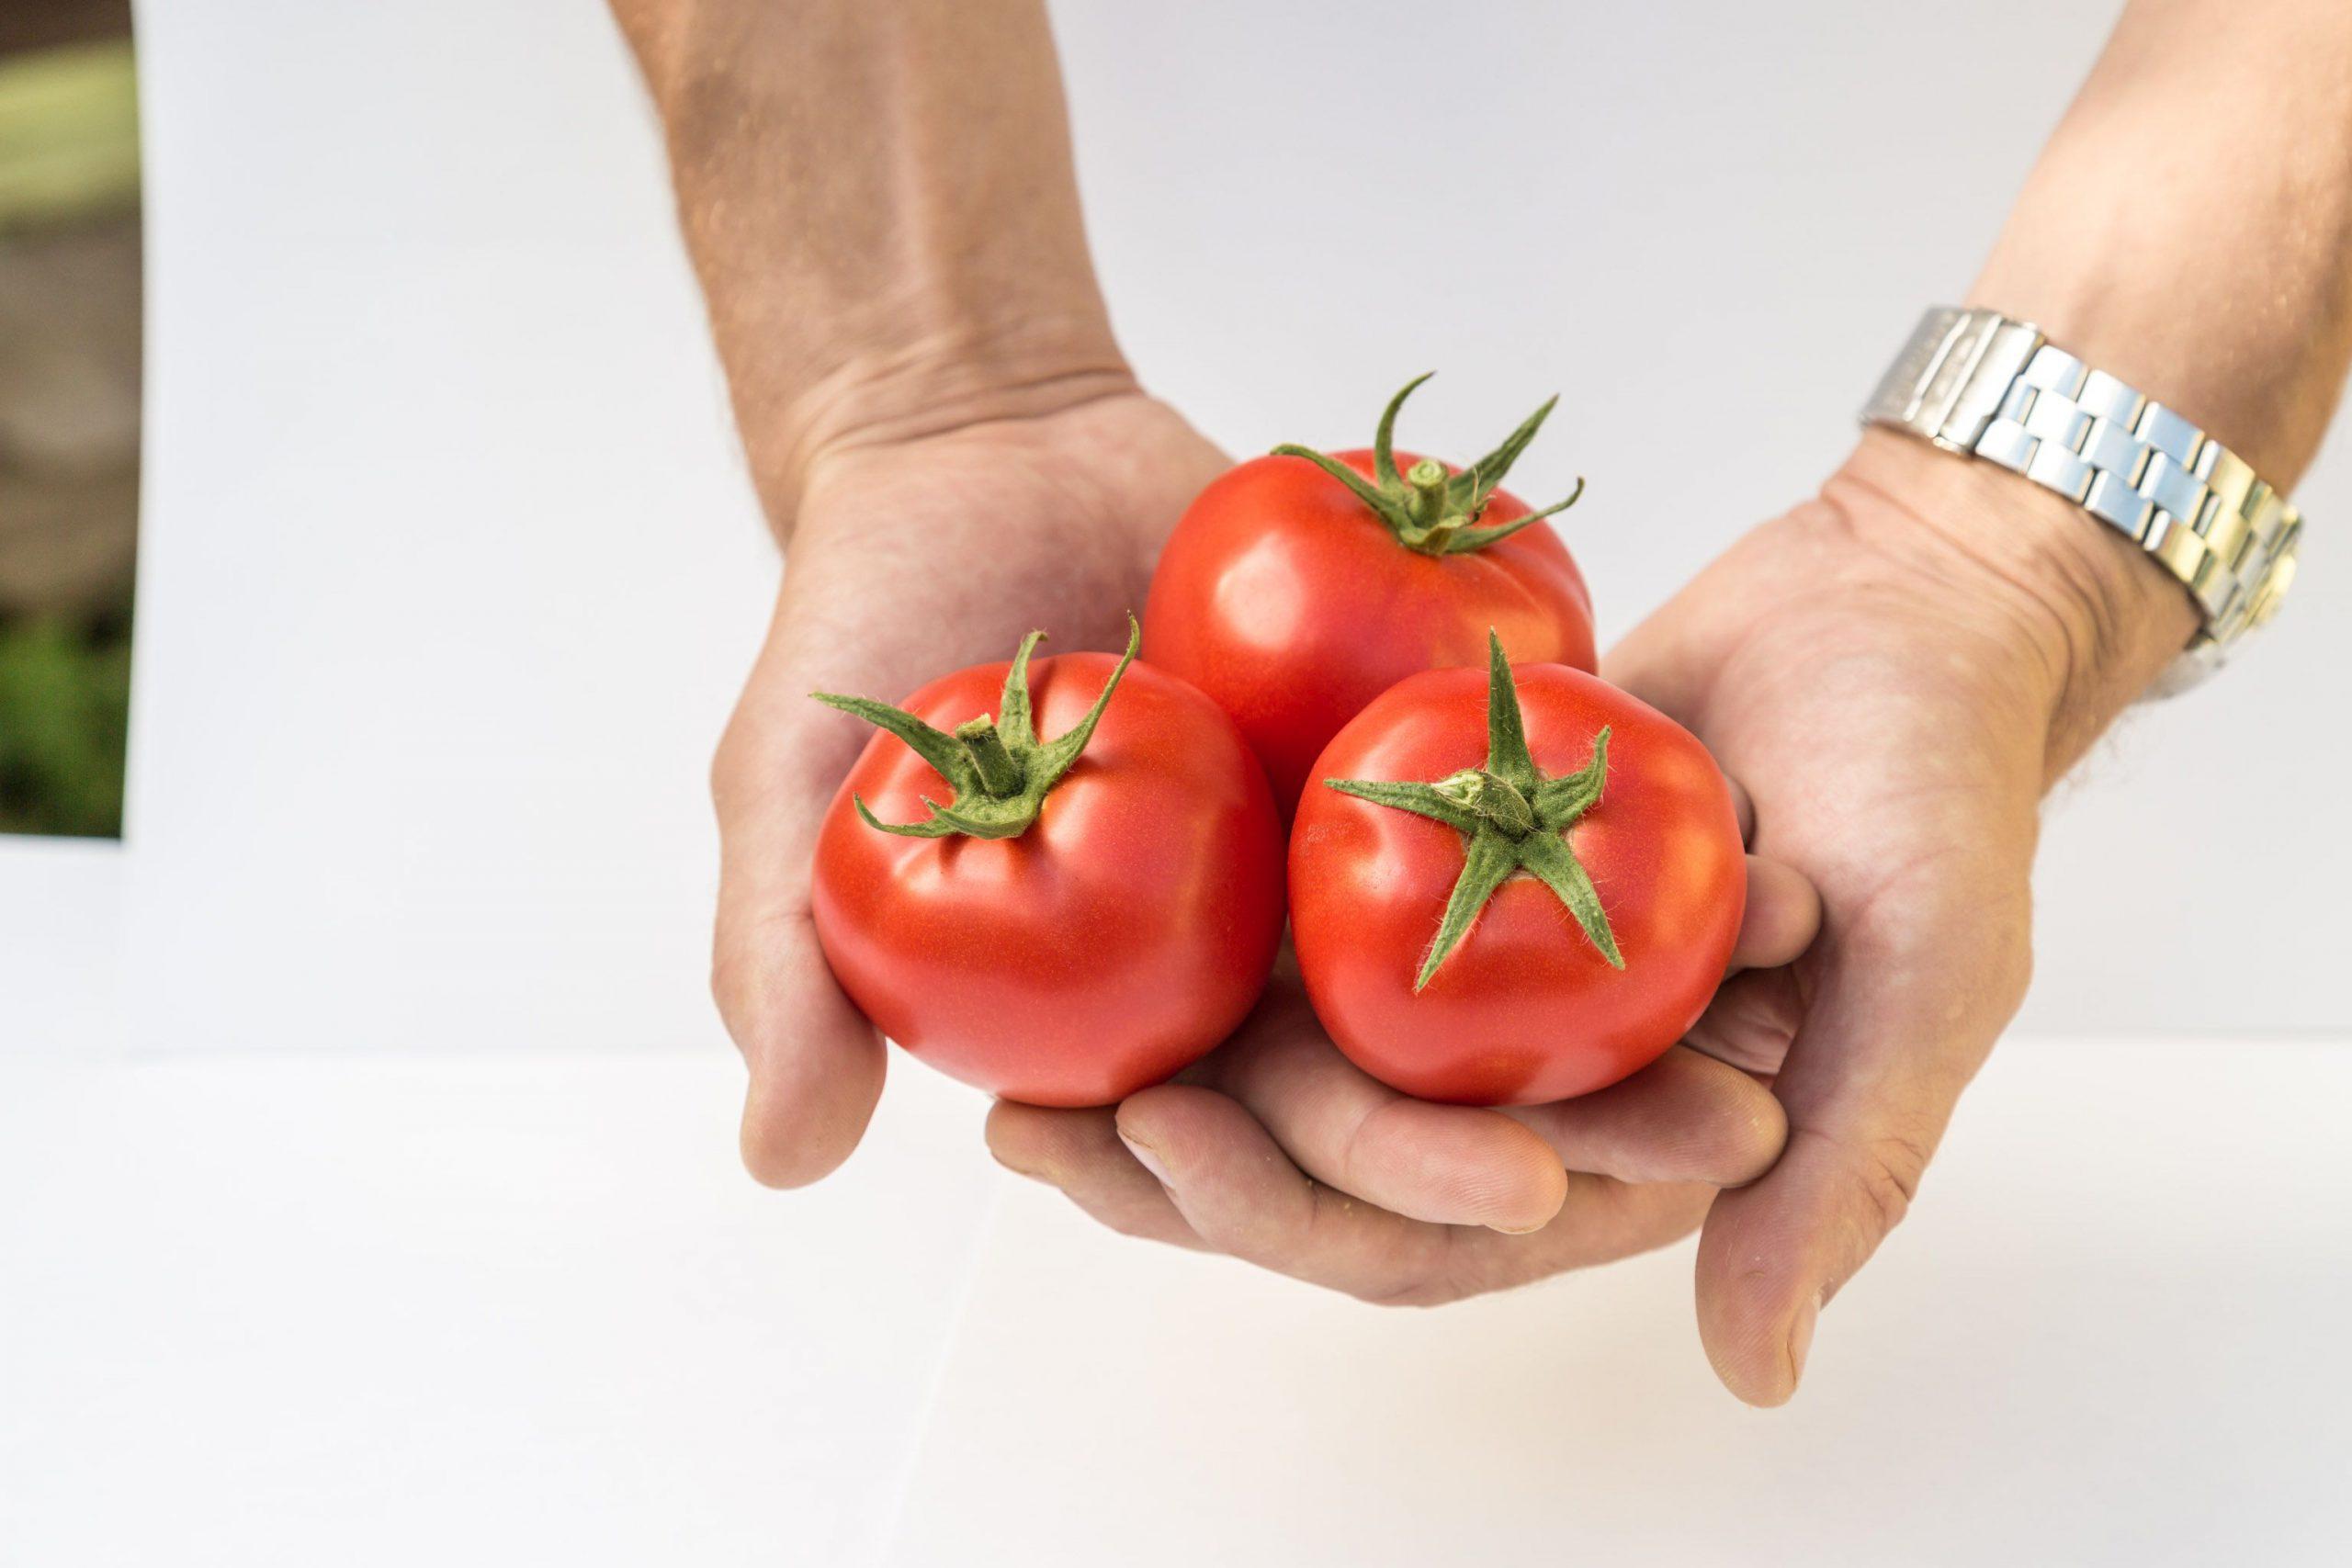 сорт томатов под название Любаша